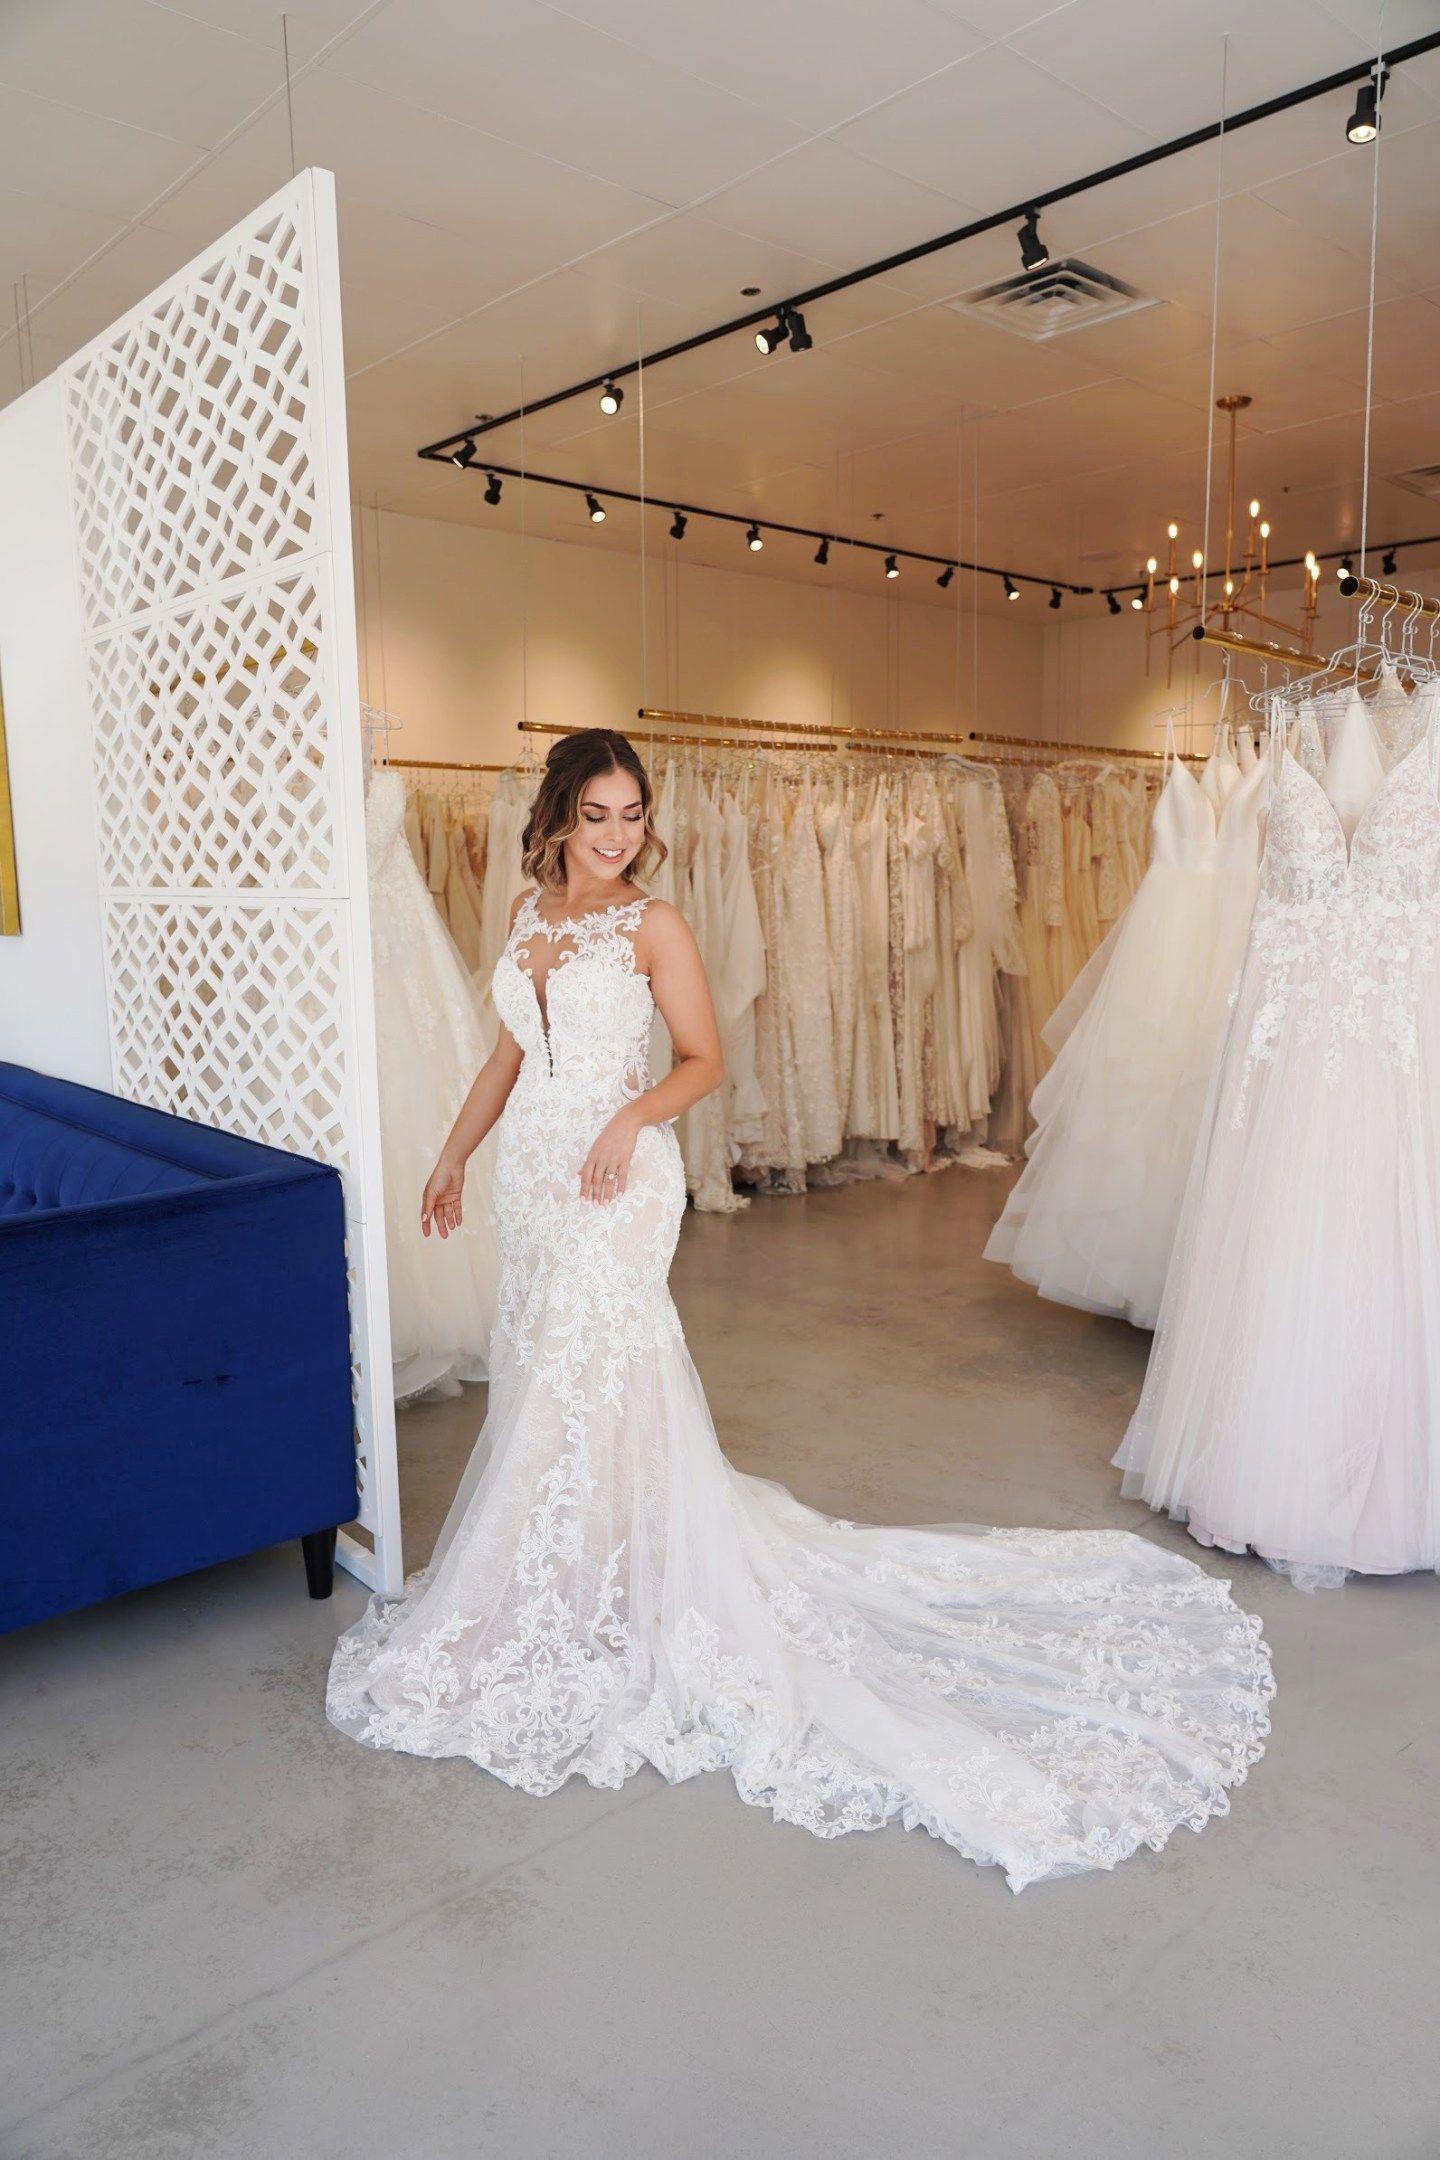 Wedding Dress Try On With Essense Of Australia Wedding Dresses Wedding Dresses Lace Dresses [ 2160 x 1440 Pixel ]